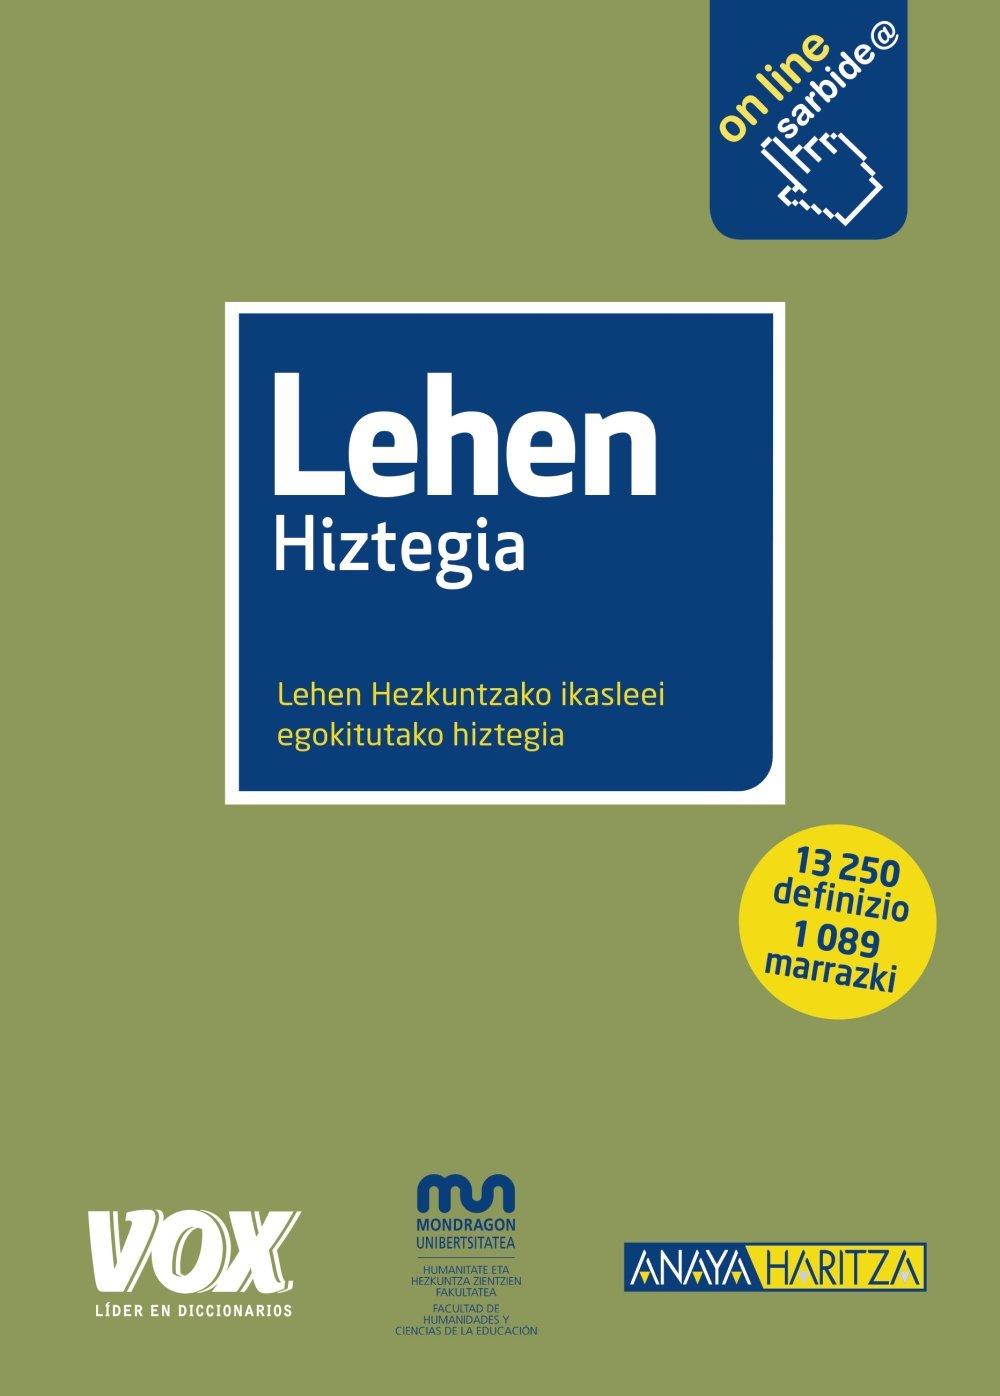 Lehen Hiztegia (Vox - Lengua Vasca): Amazon.es: Octavi Intente, Jaume Bosch  Martínez, Marc Franco: Libros